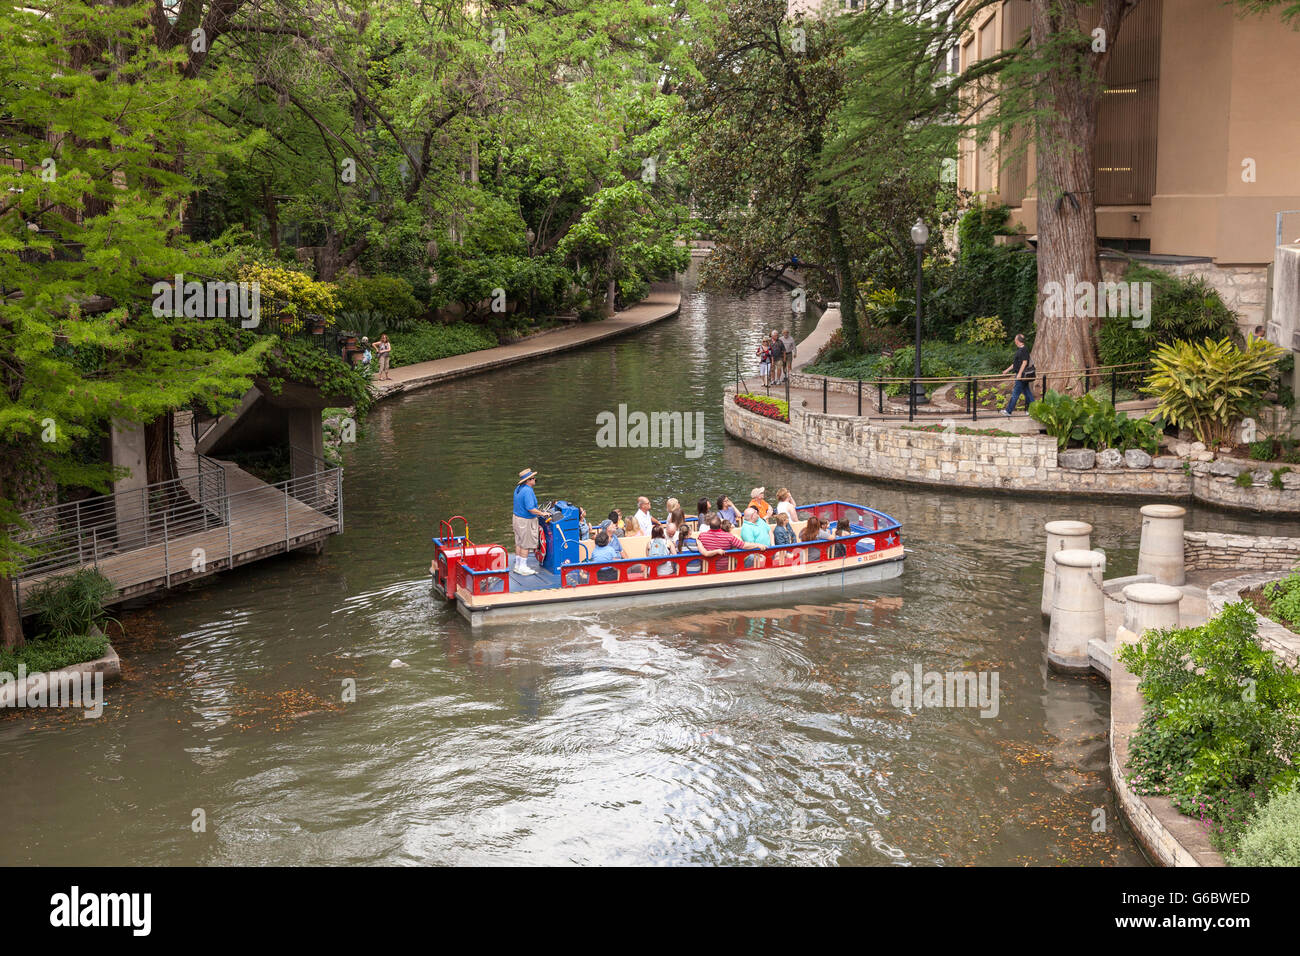 San Antonio River Walk, Texas - Stock Image